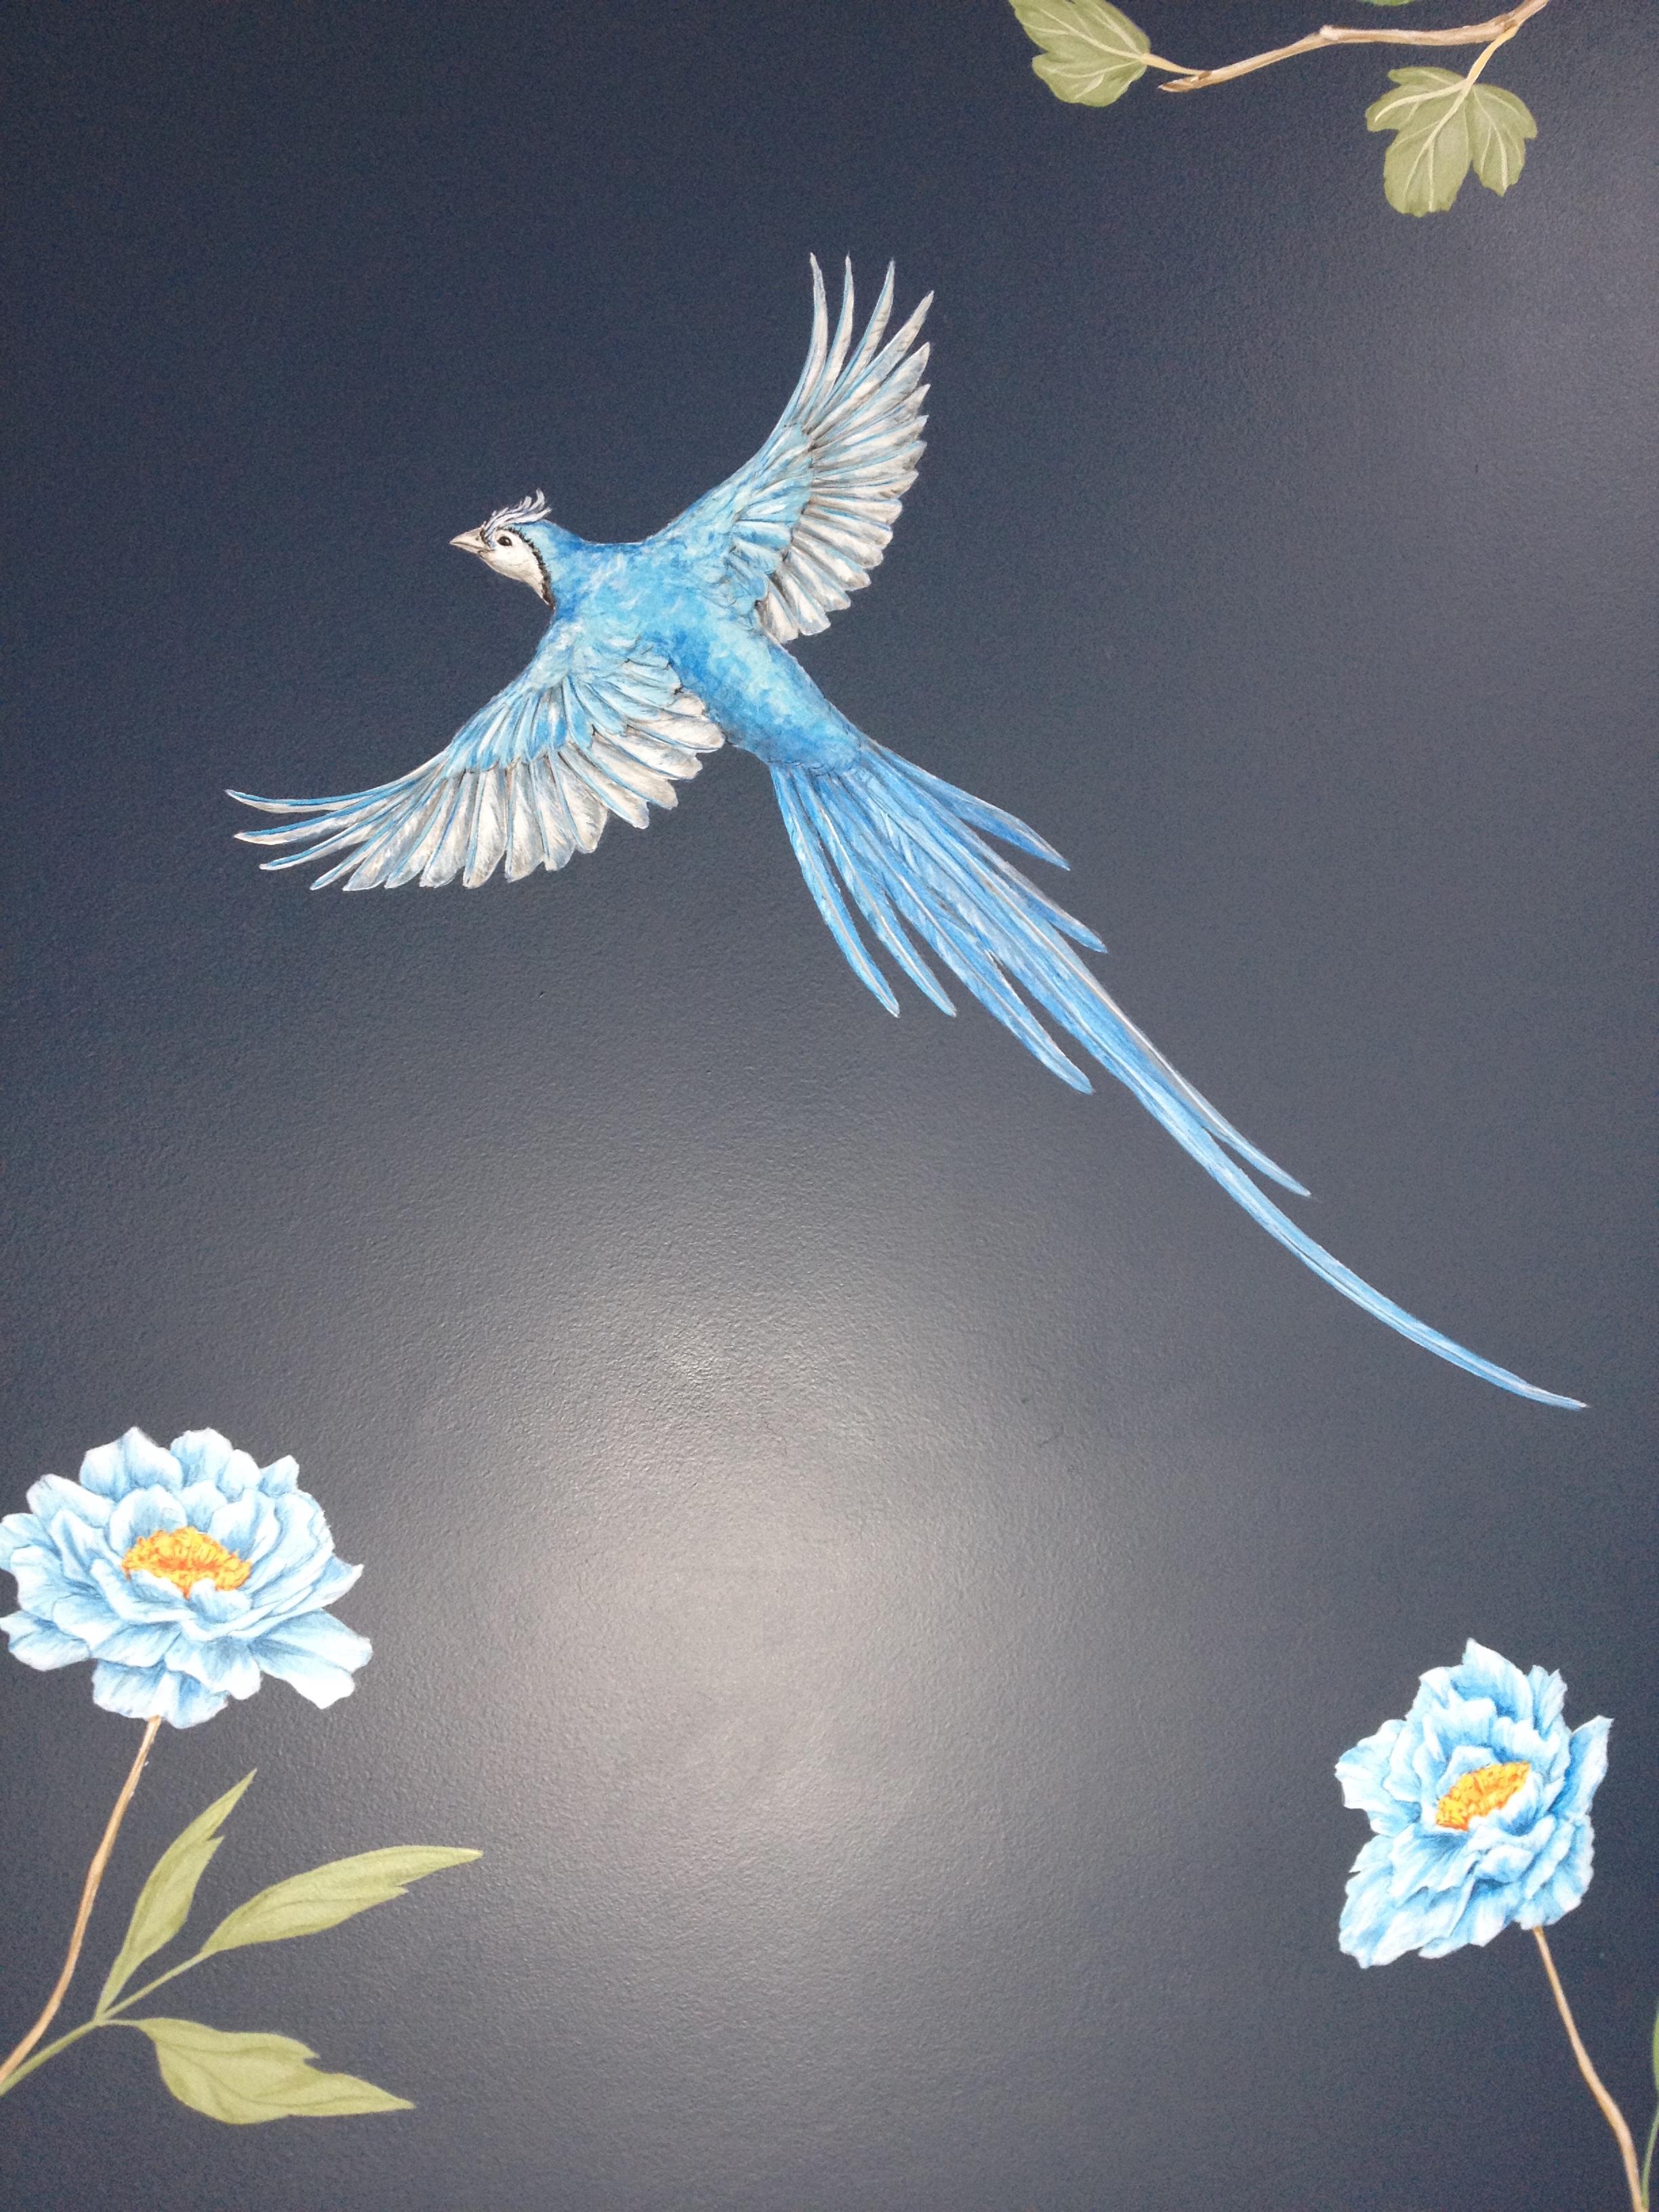 fig and jay bathroom mural DETAIL 2, frederick Wimsett bespoke wall art.JPG